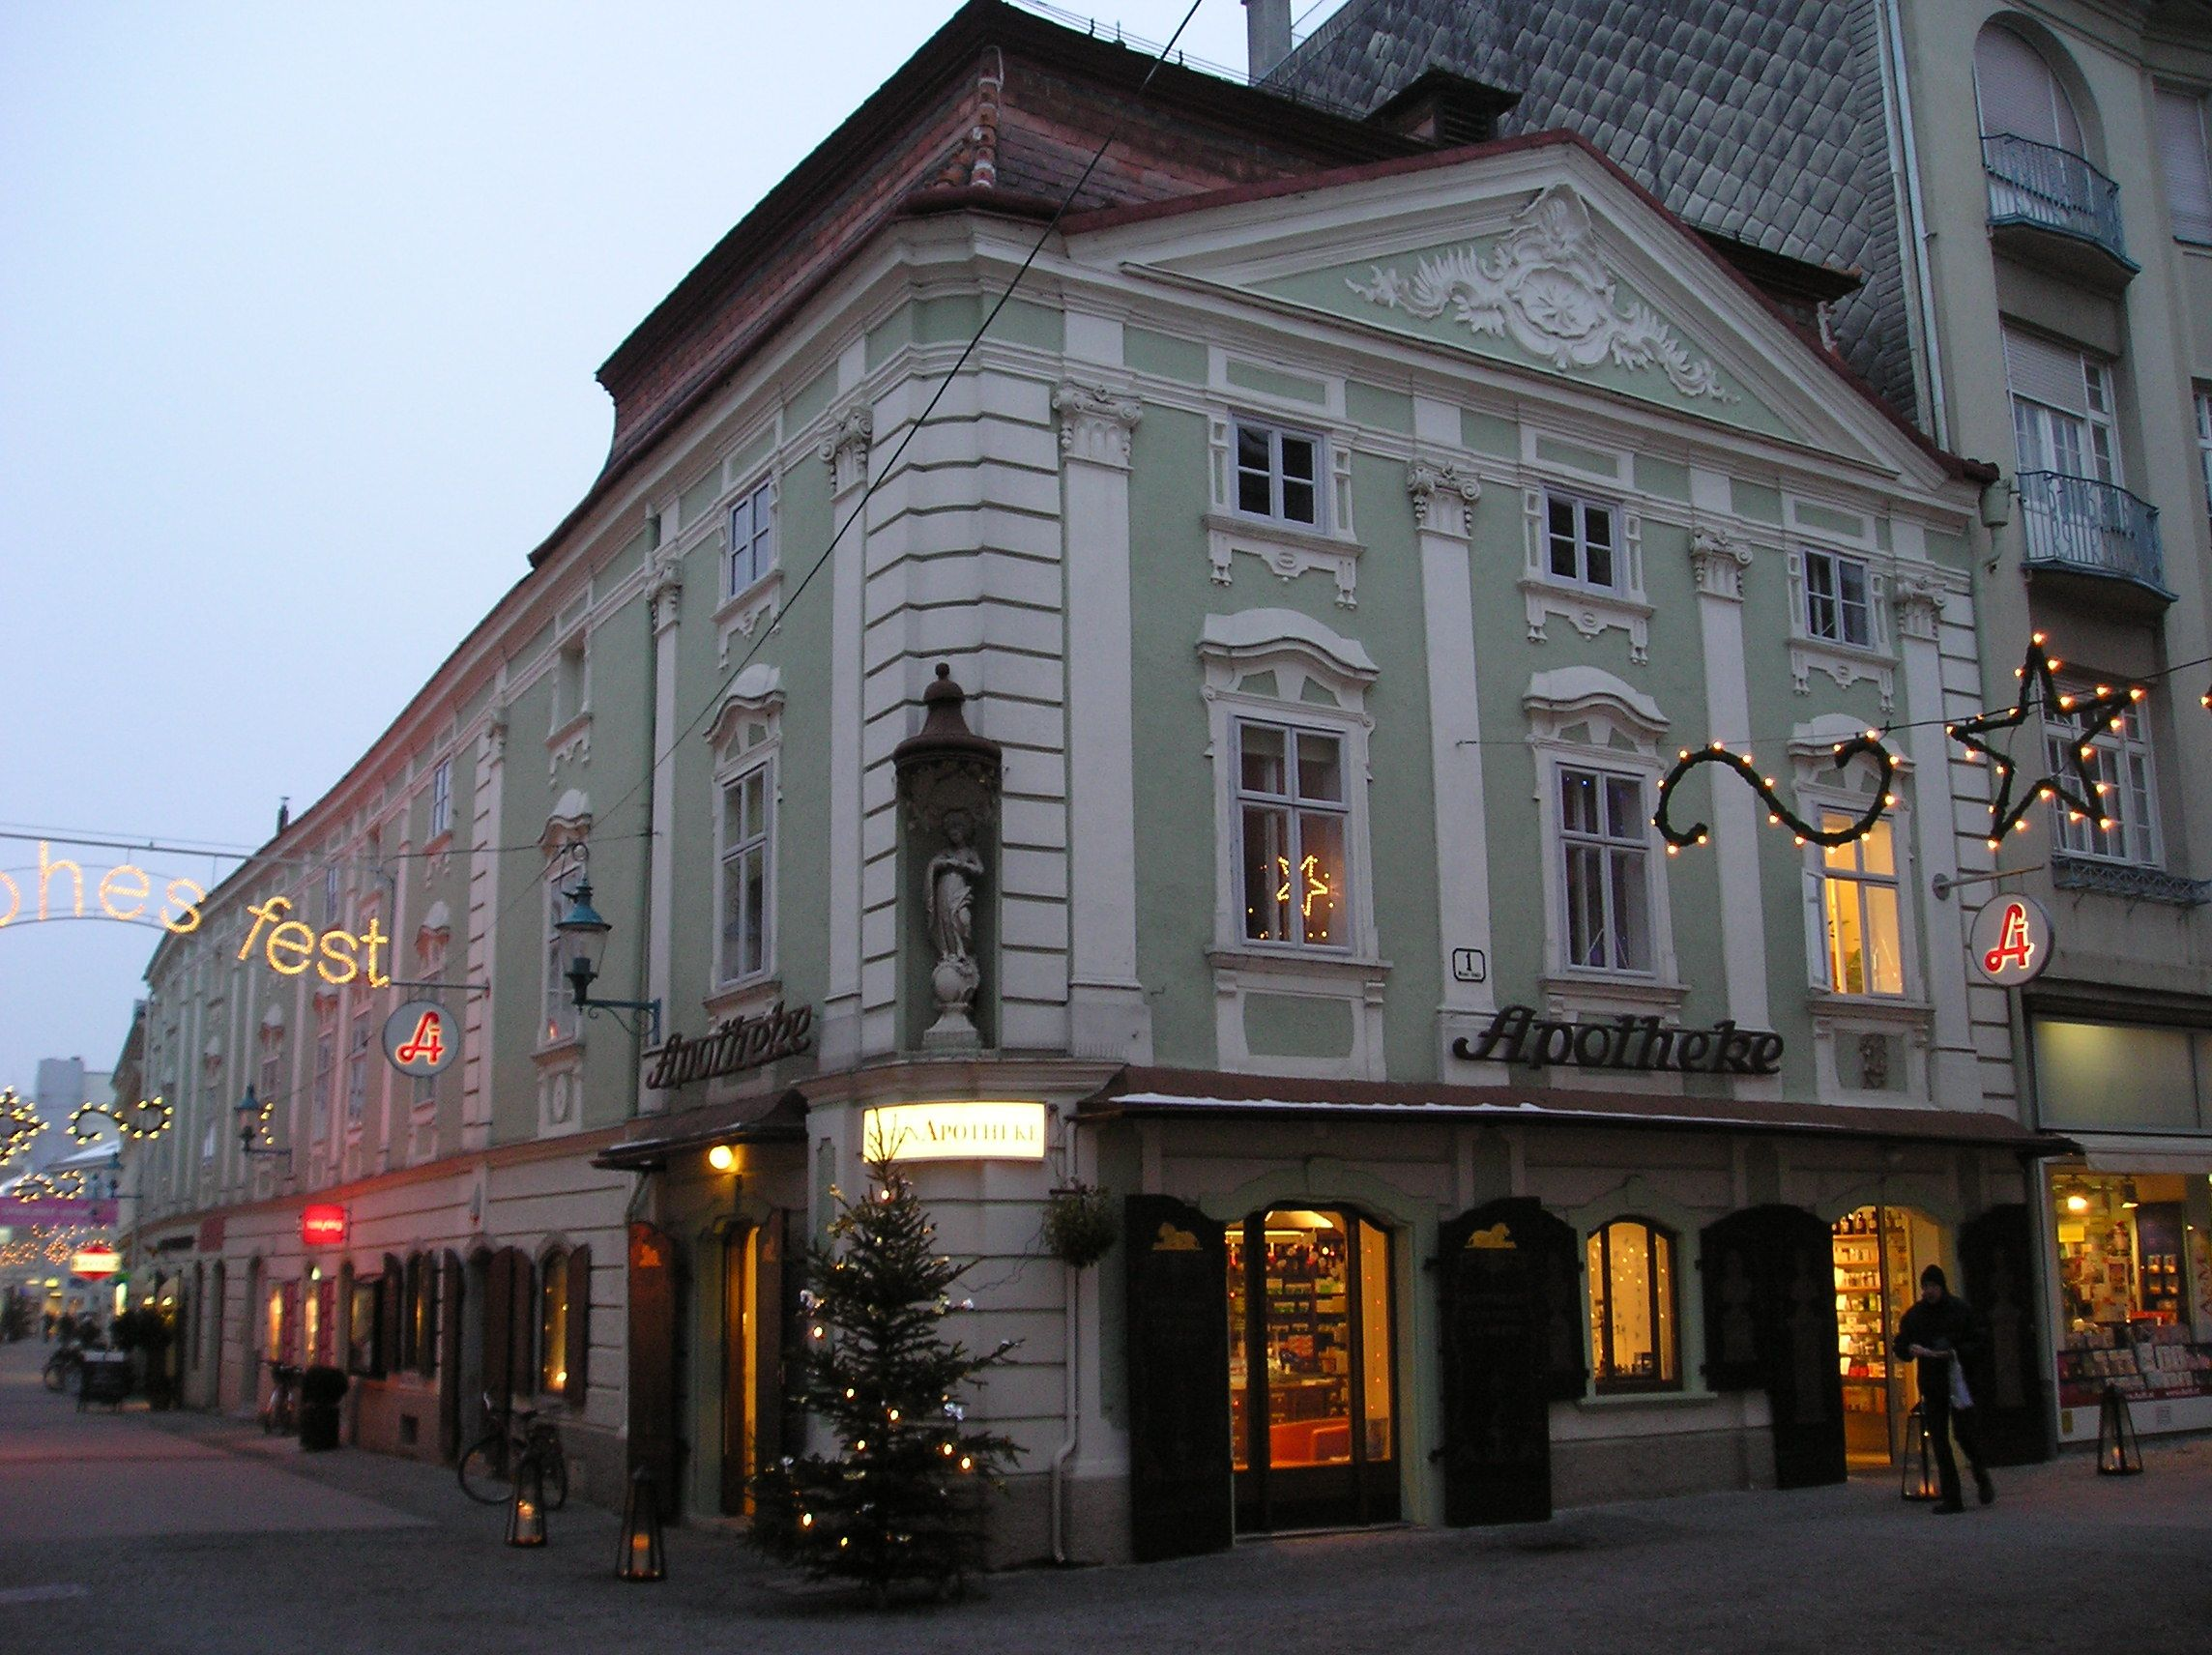 a pharmacy in st polten caleb 39 s first area st polten austria pharmacy zum goldenen. Black Bedroom Furniture Sets. Home Design Ideas